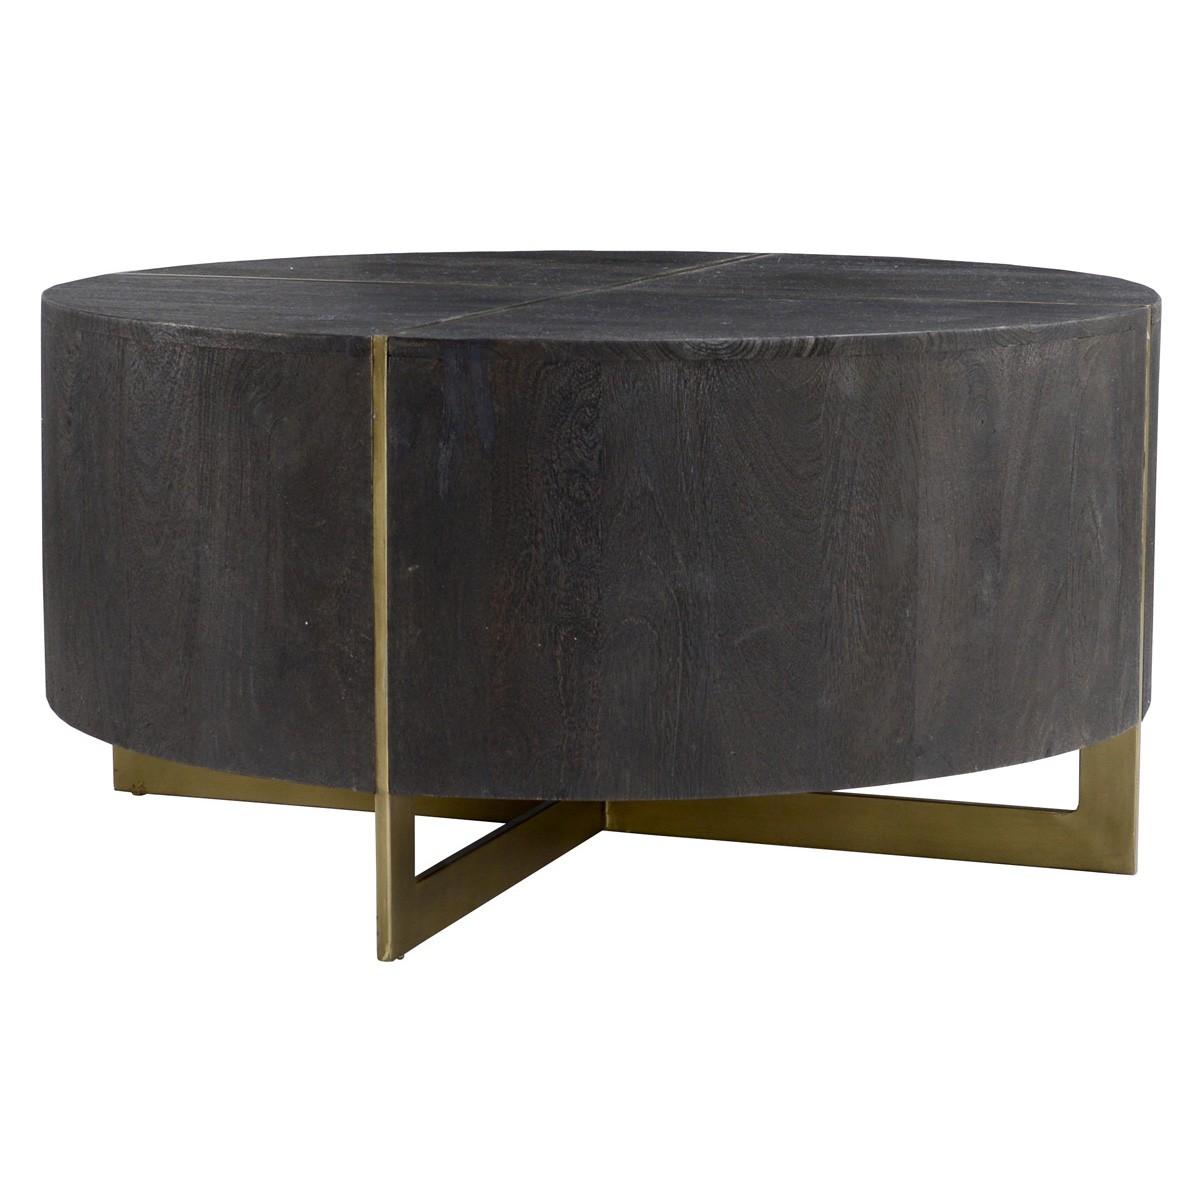 - The Desmond Round End Table Espresso The Find Boutique